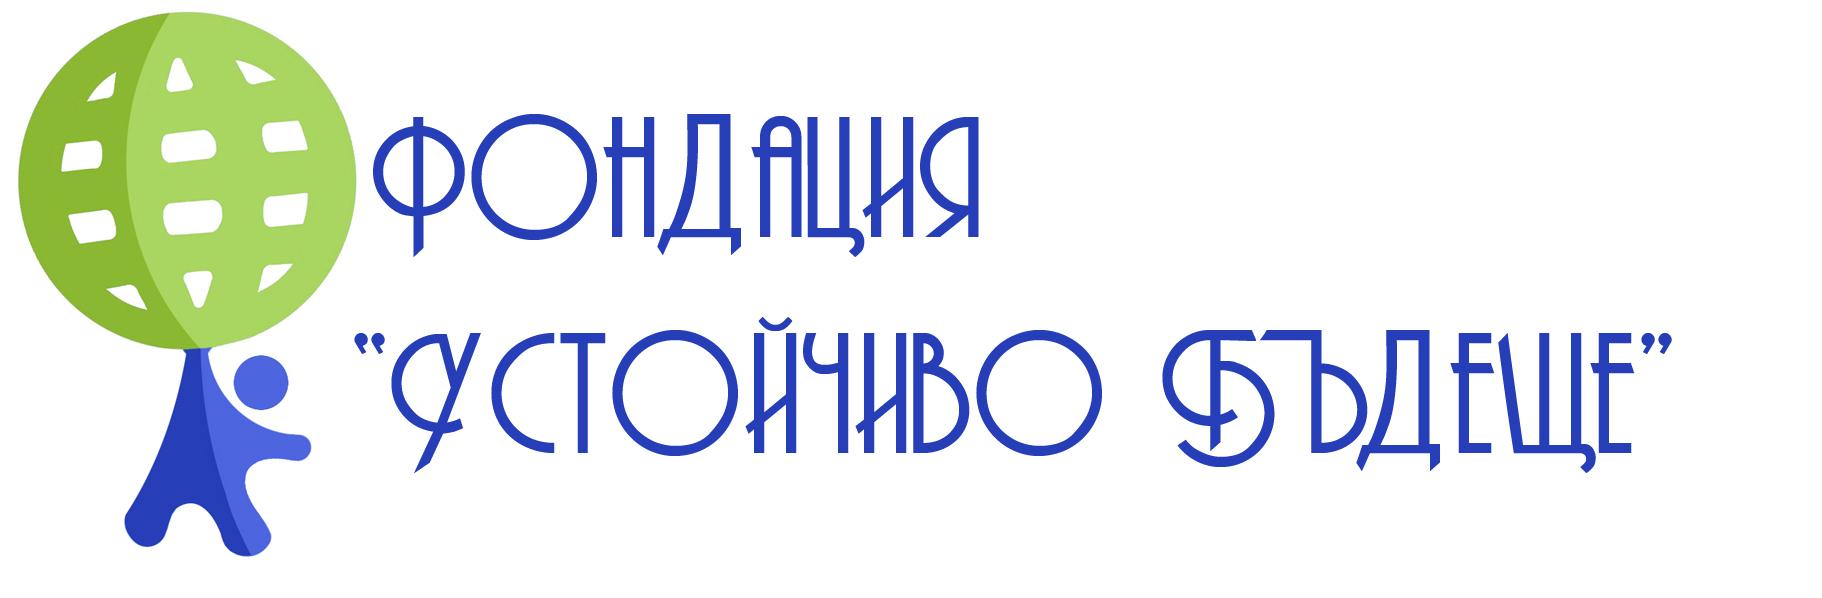 USTOI4IVO-BUDESHTE-logo